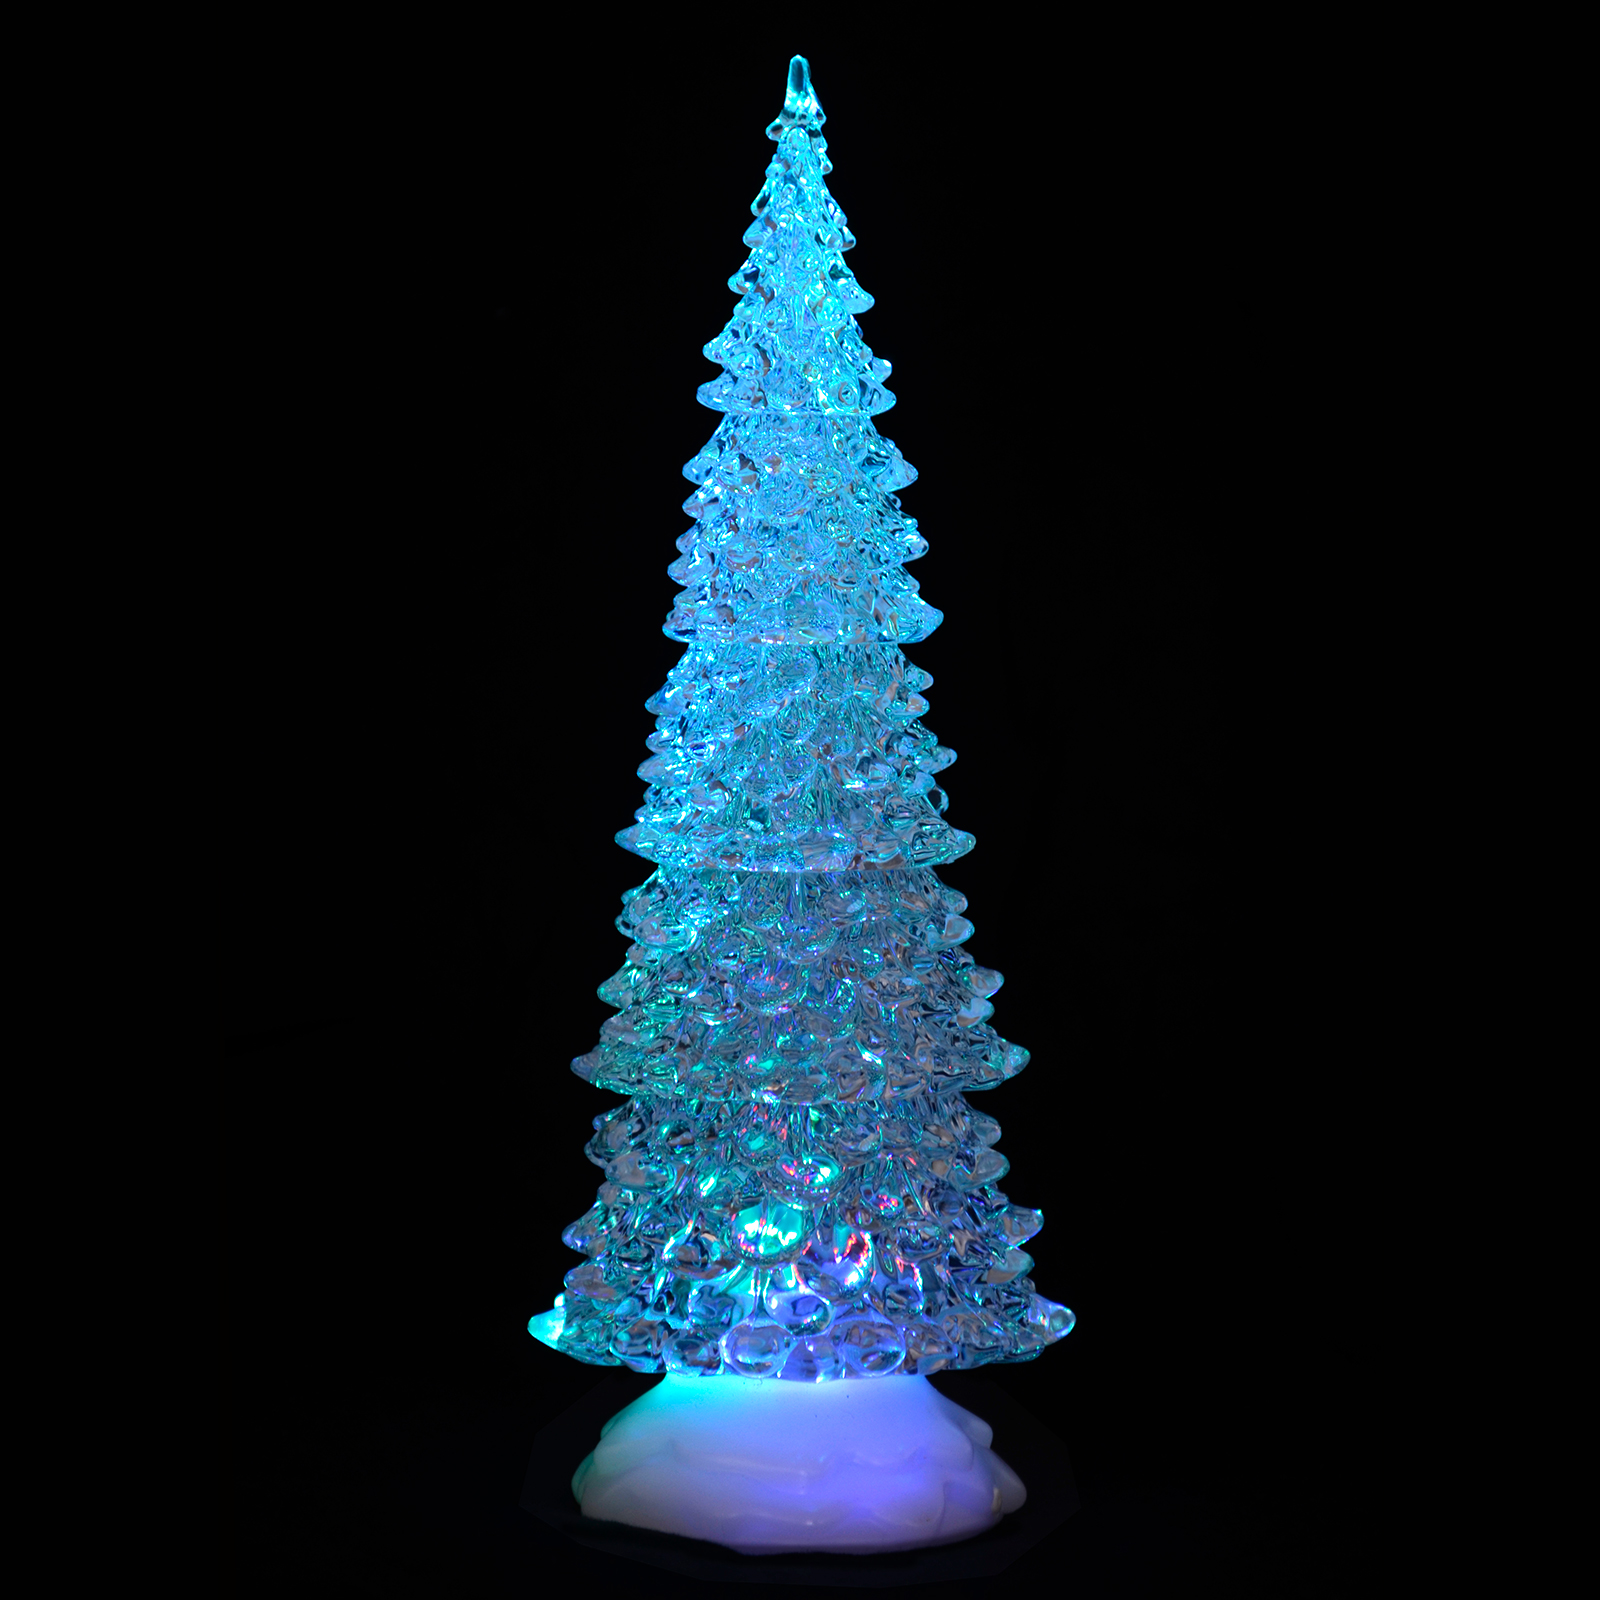 Light Up Acrylic Xmas Tree Ornament Christmas Decoration Colour ...